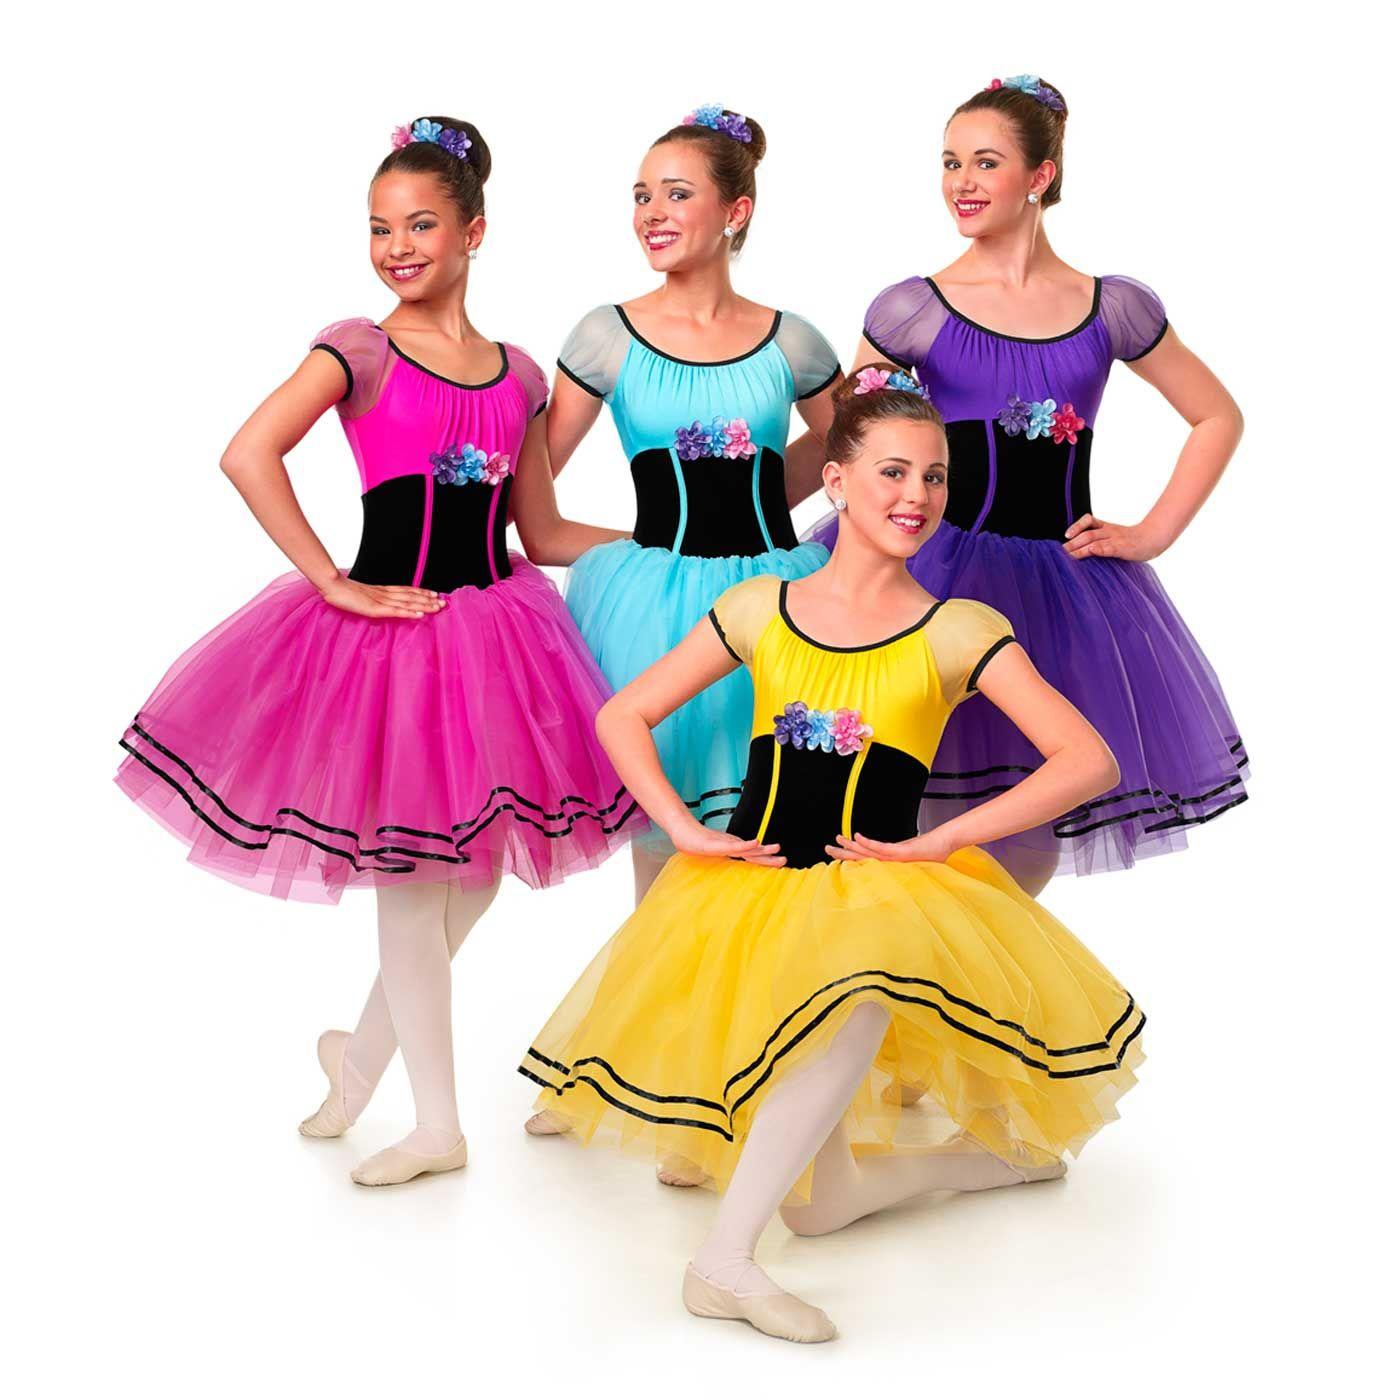 Curtain call villager cute dance costumes dance